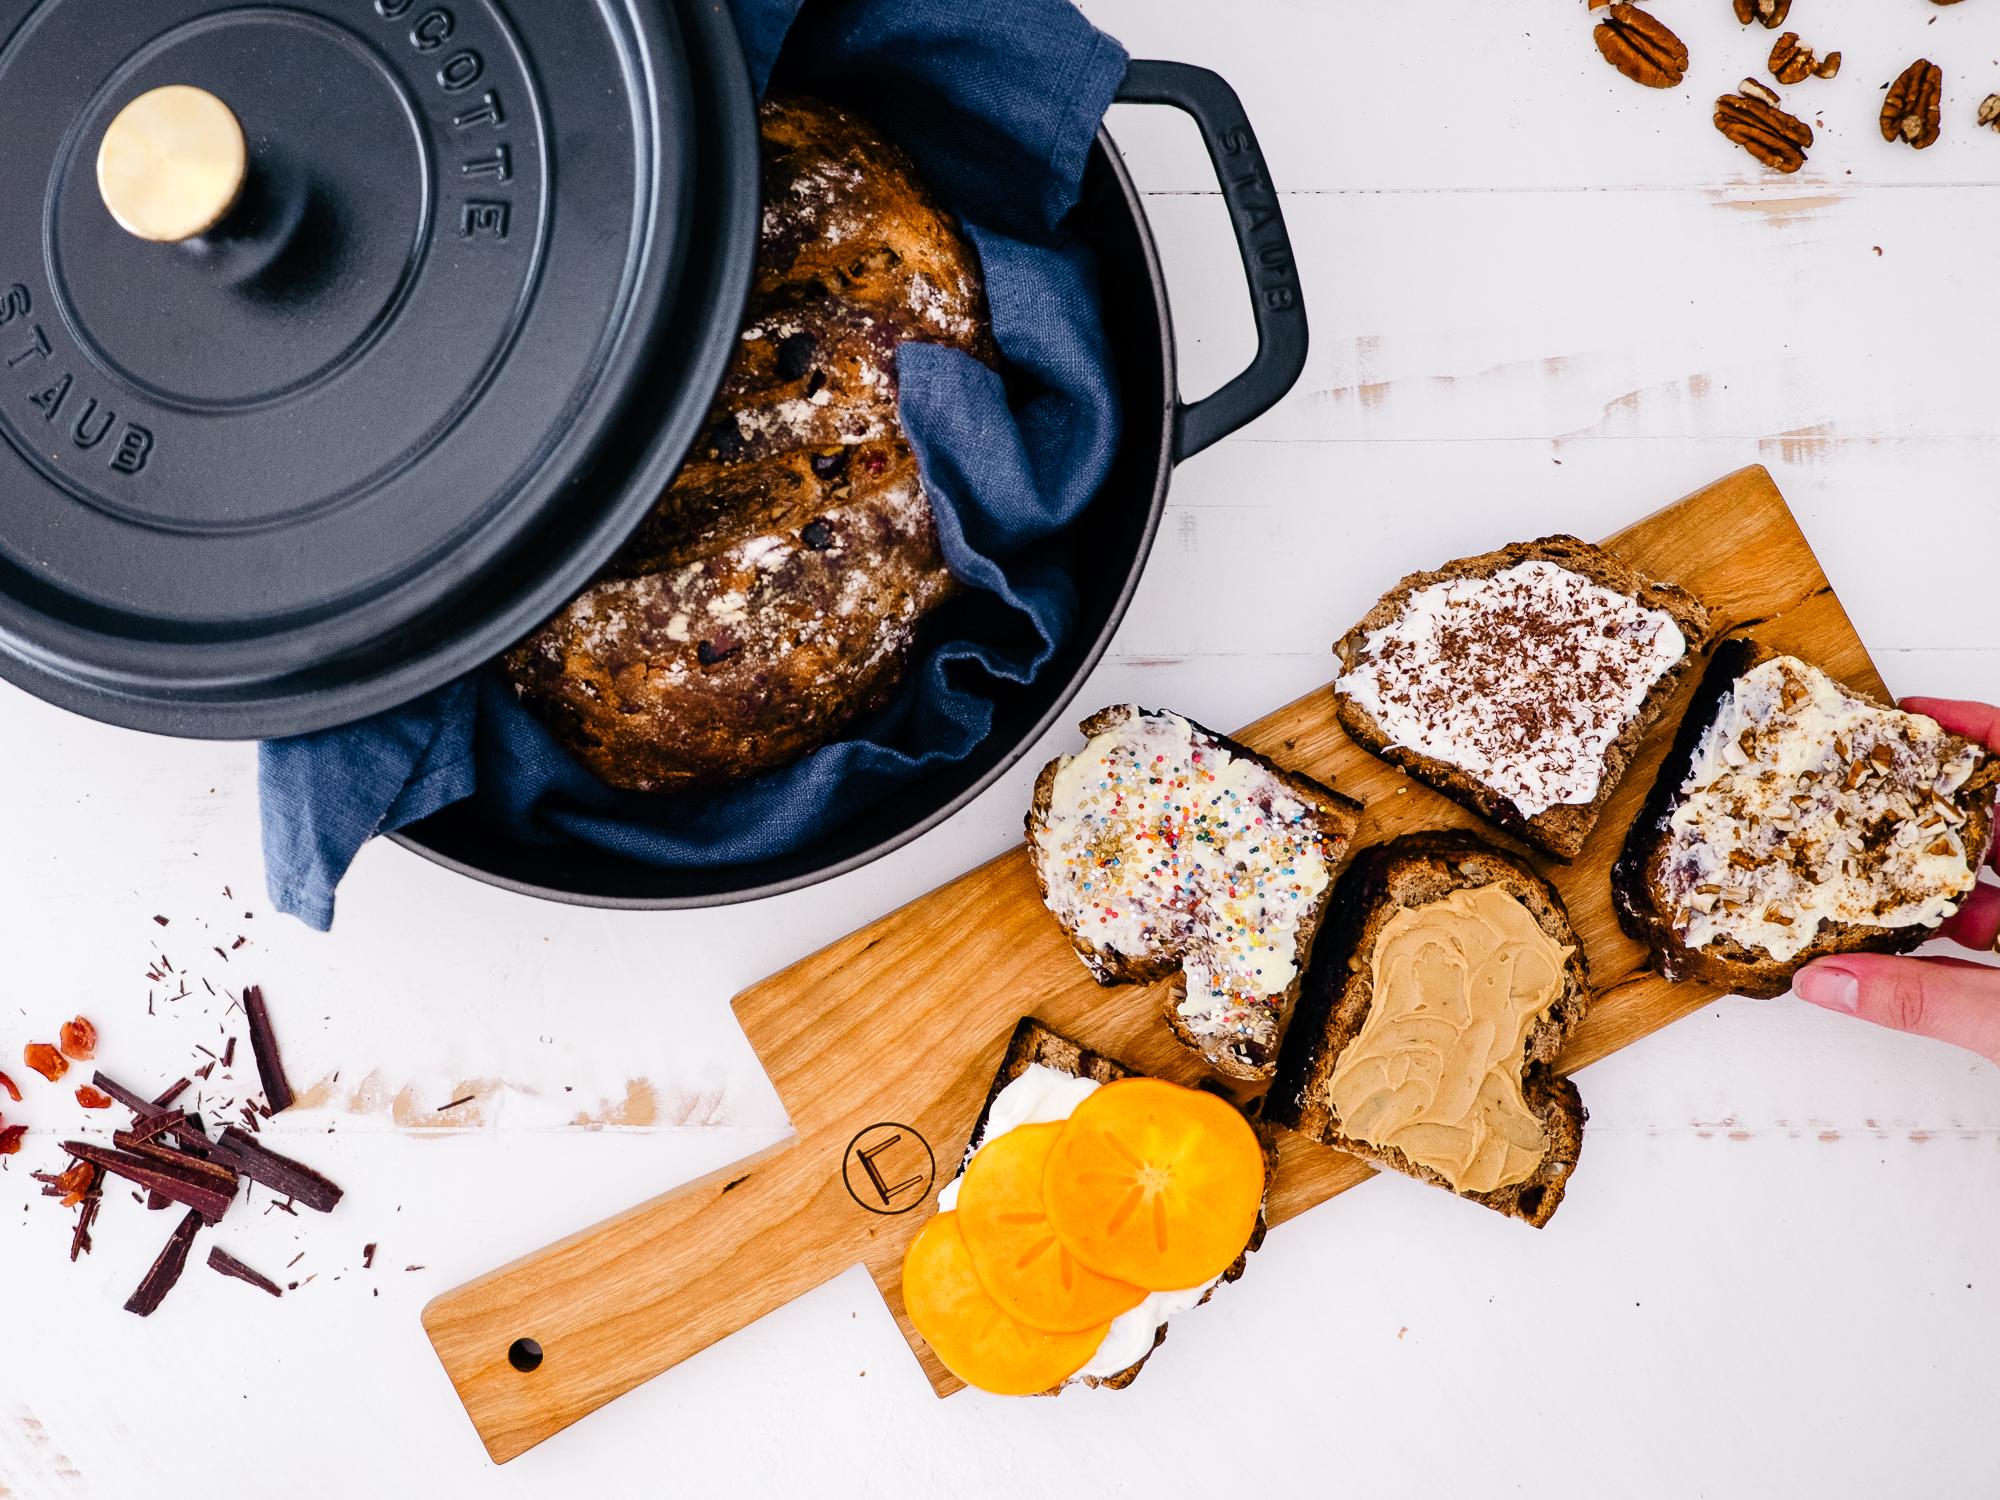 Cranberry Dark Chocolate Pecan Rustic Dutch Oven Bread Fix Feast Flair